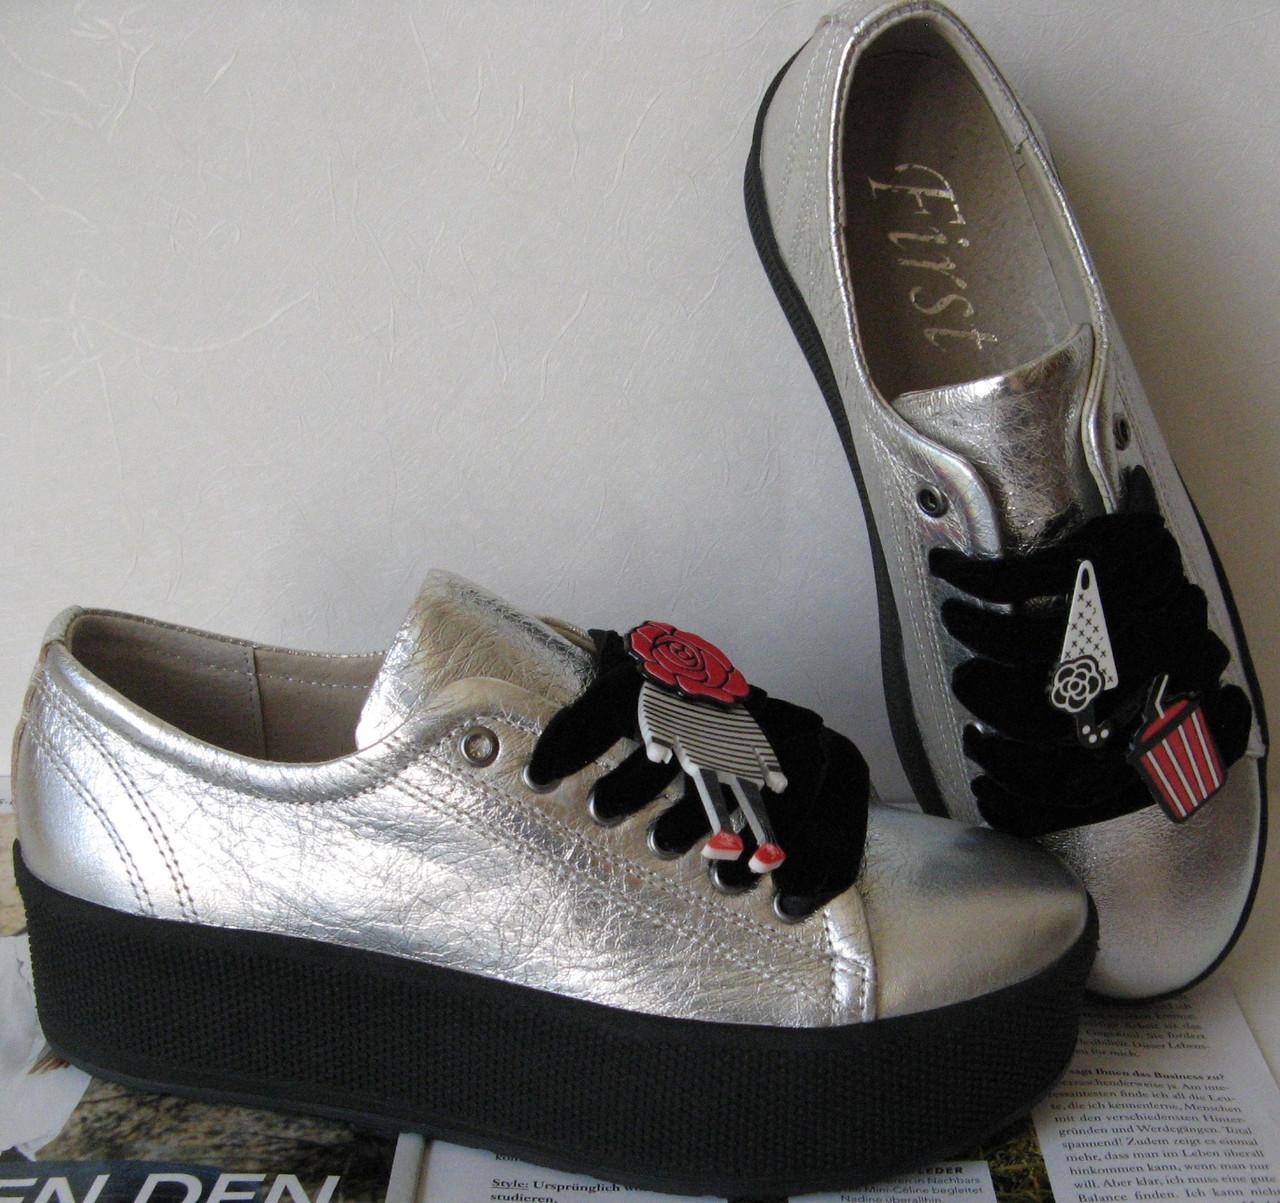 Mante first! Женские кеды туфли кроссовки серебро сникерсы слипы ... 363dee2e02901